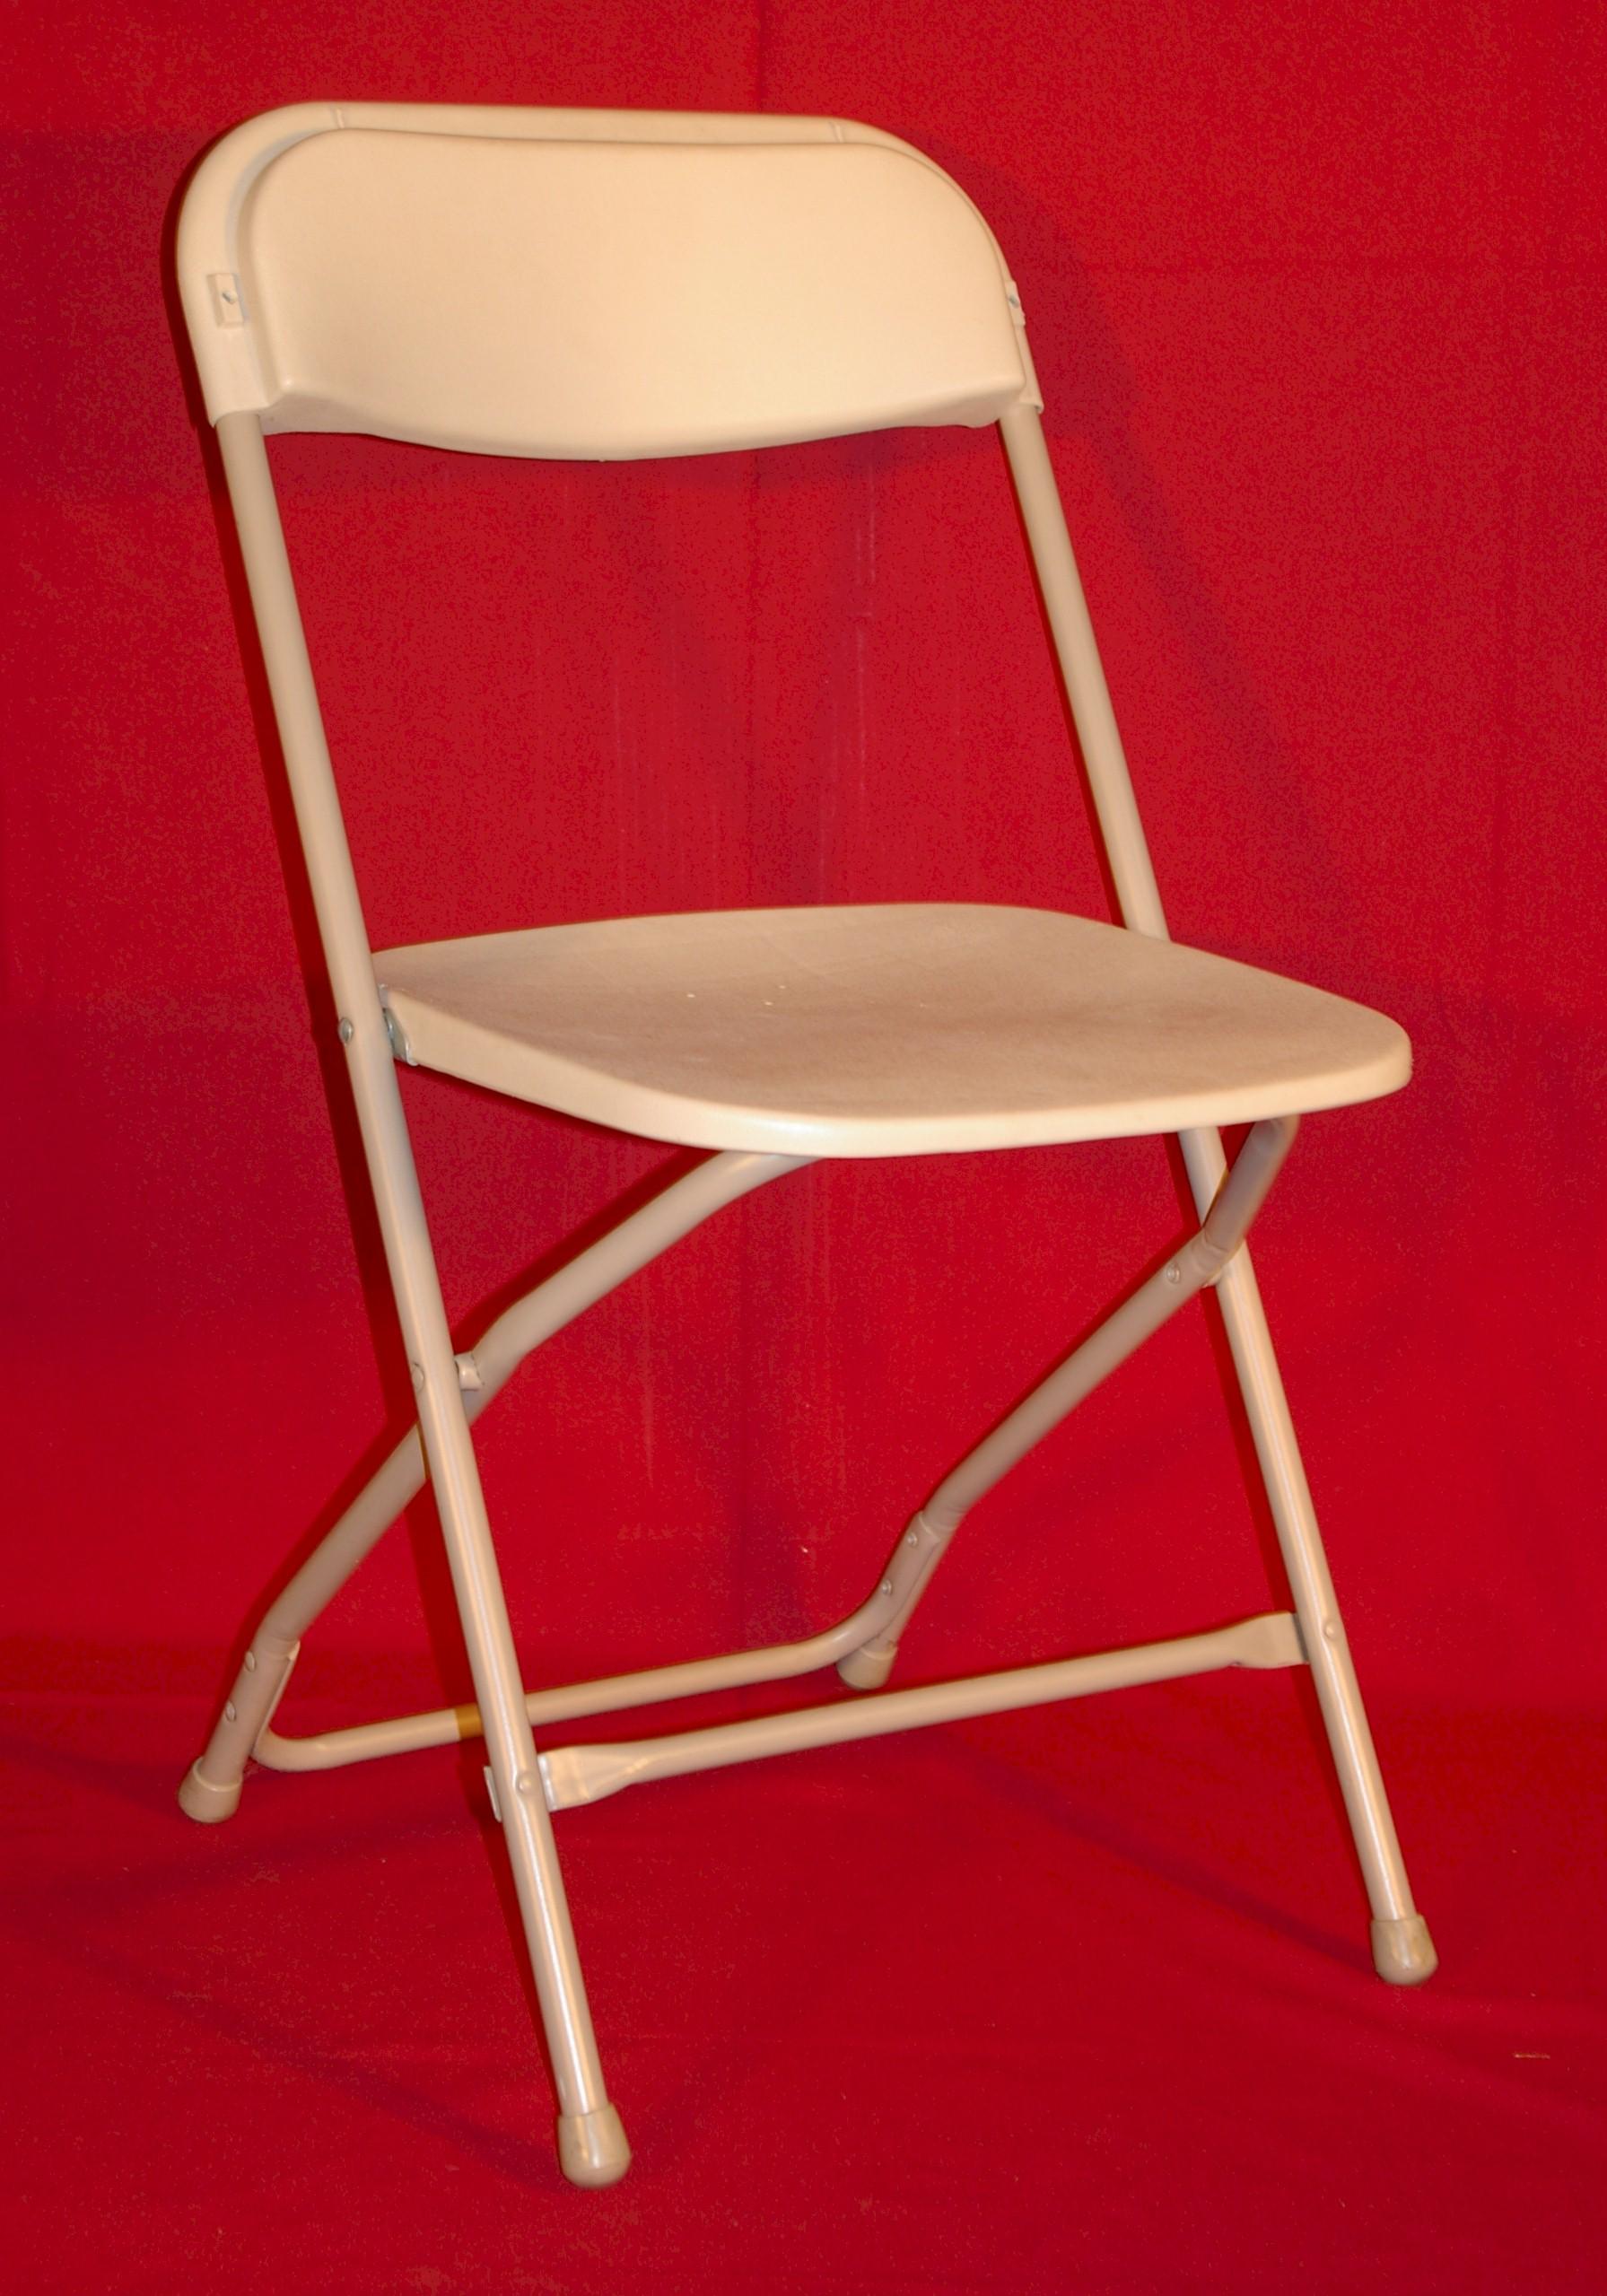 renting folding chairs cute for bedrooms samsonite chair taylor rental of torrington